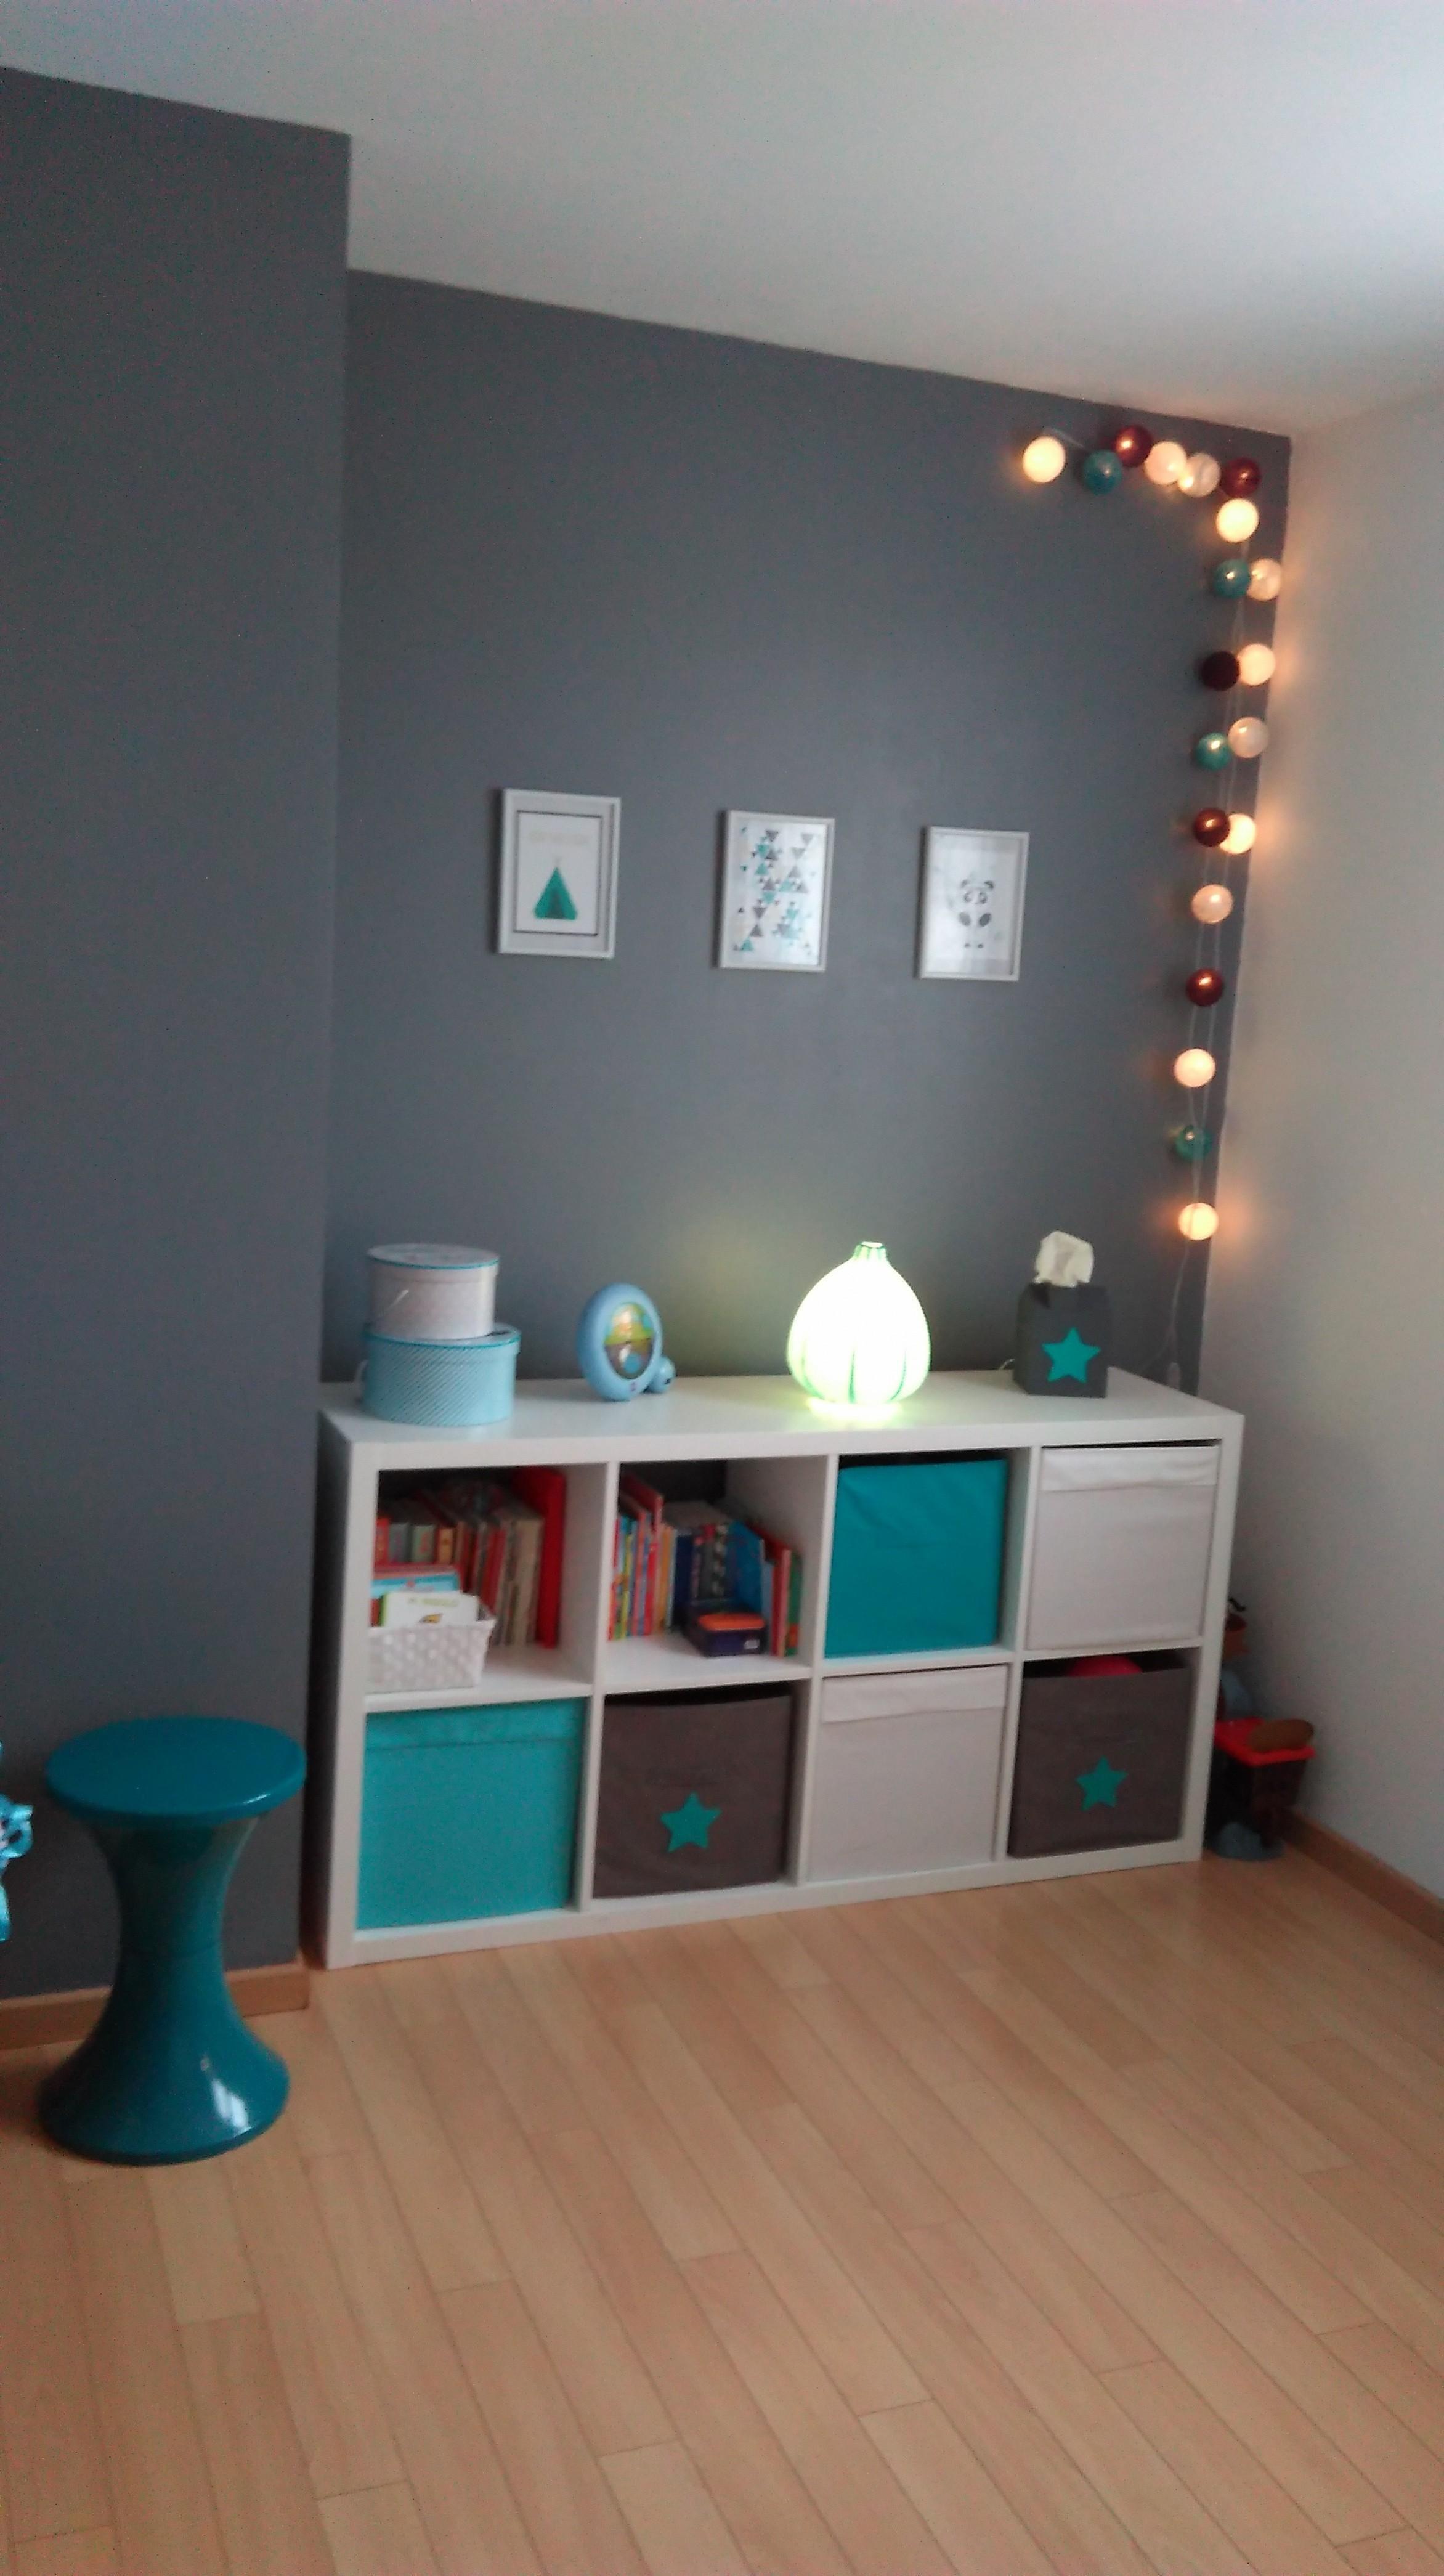 10 Deco Chambre Garcon 4 Ans Decor Boy Room Room